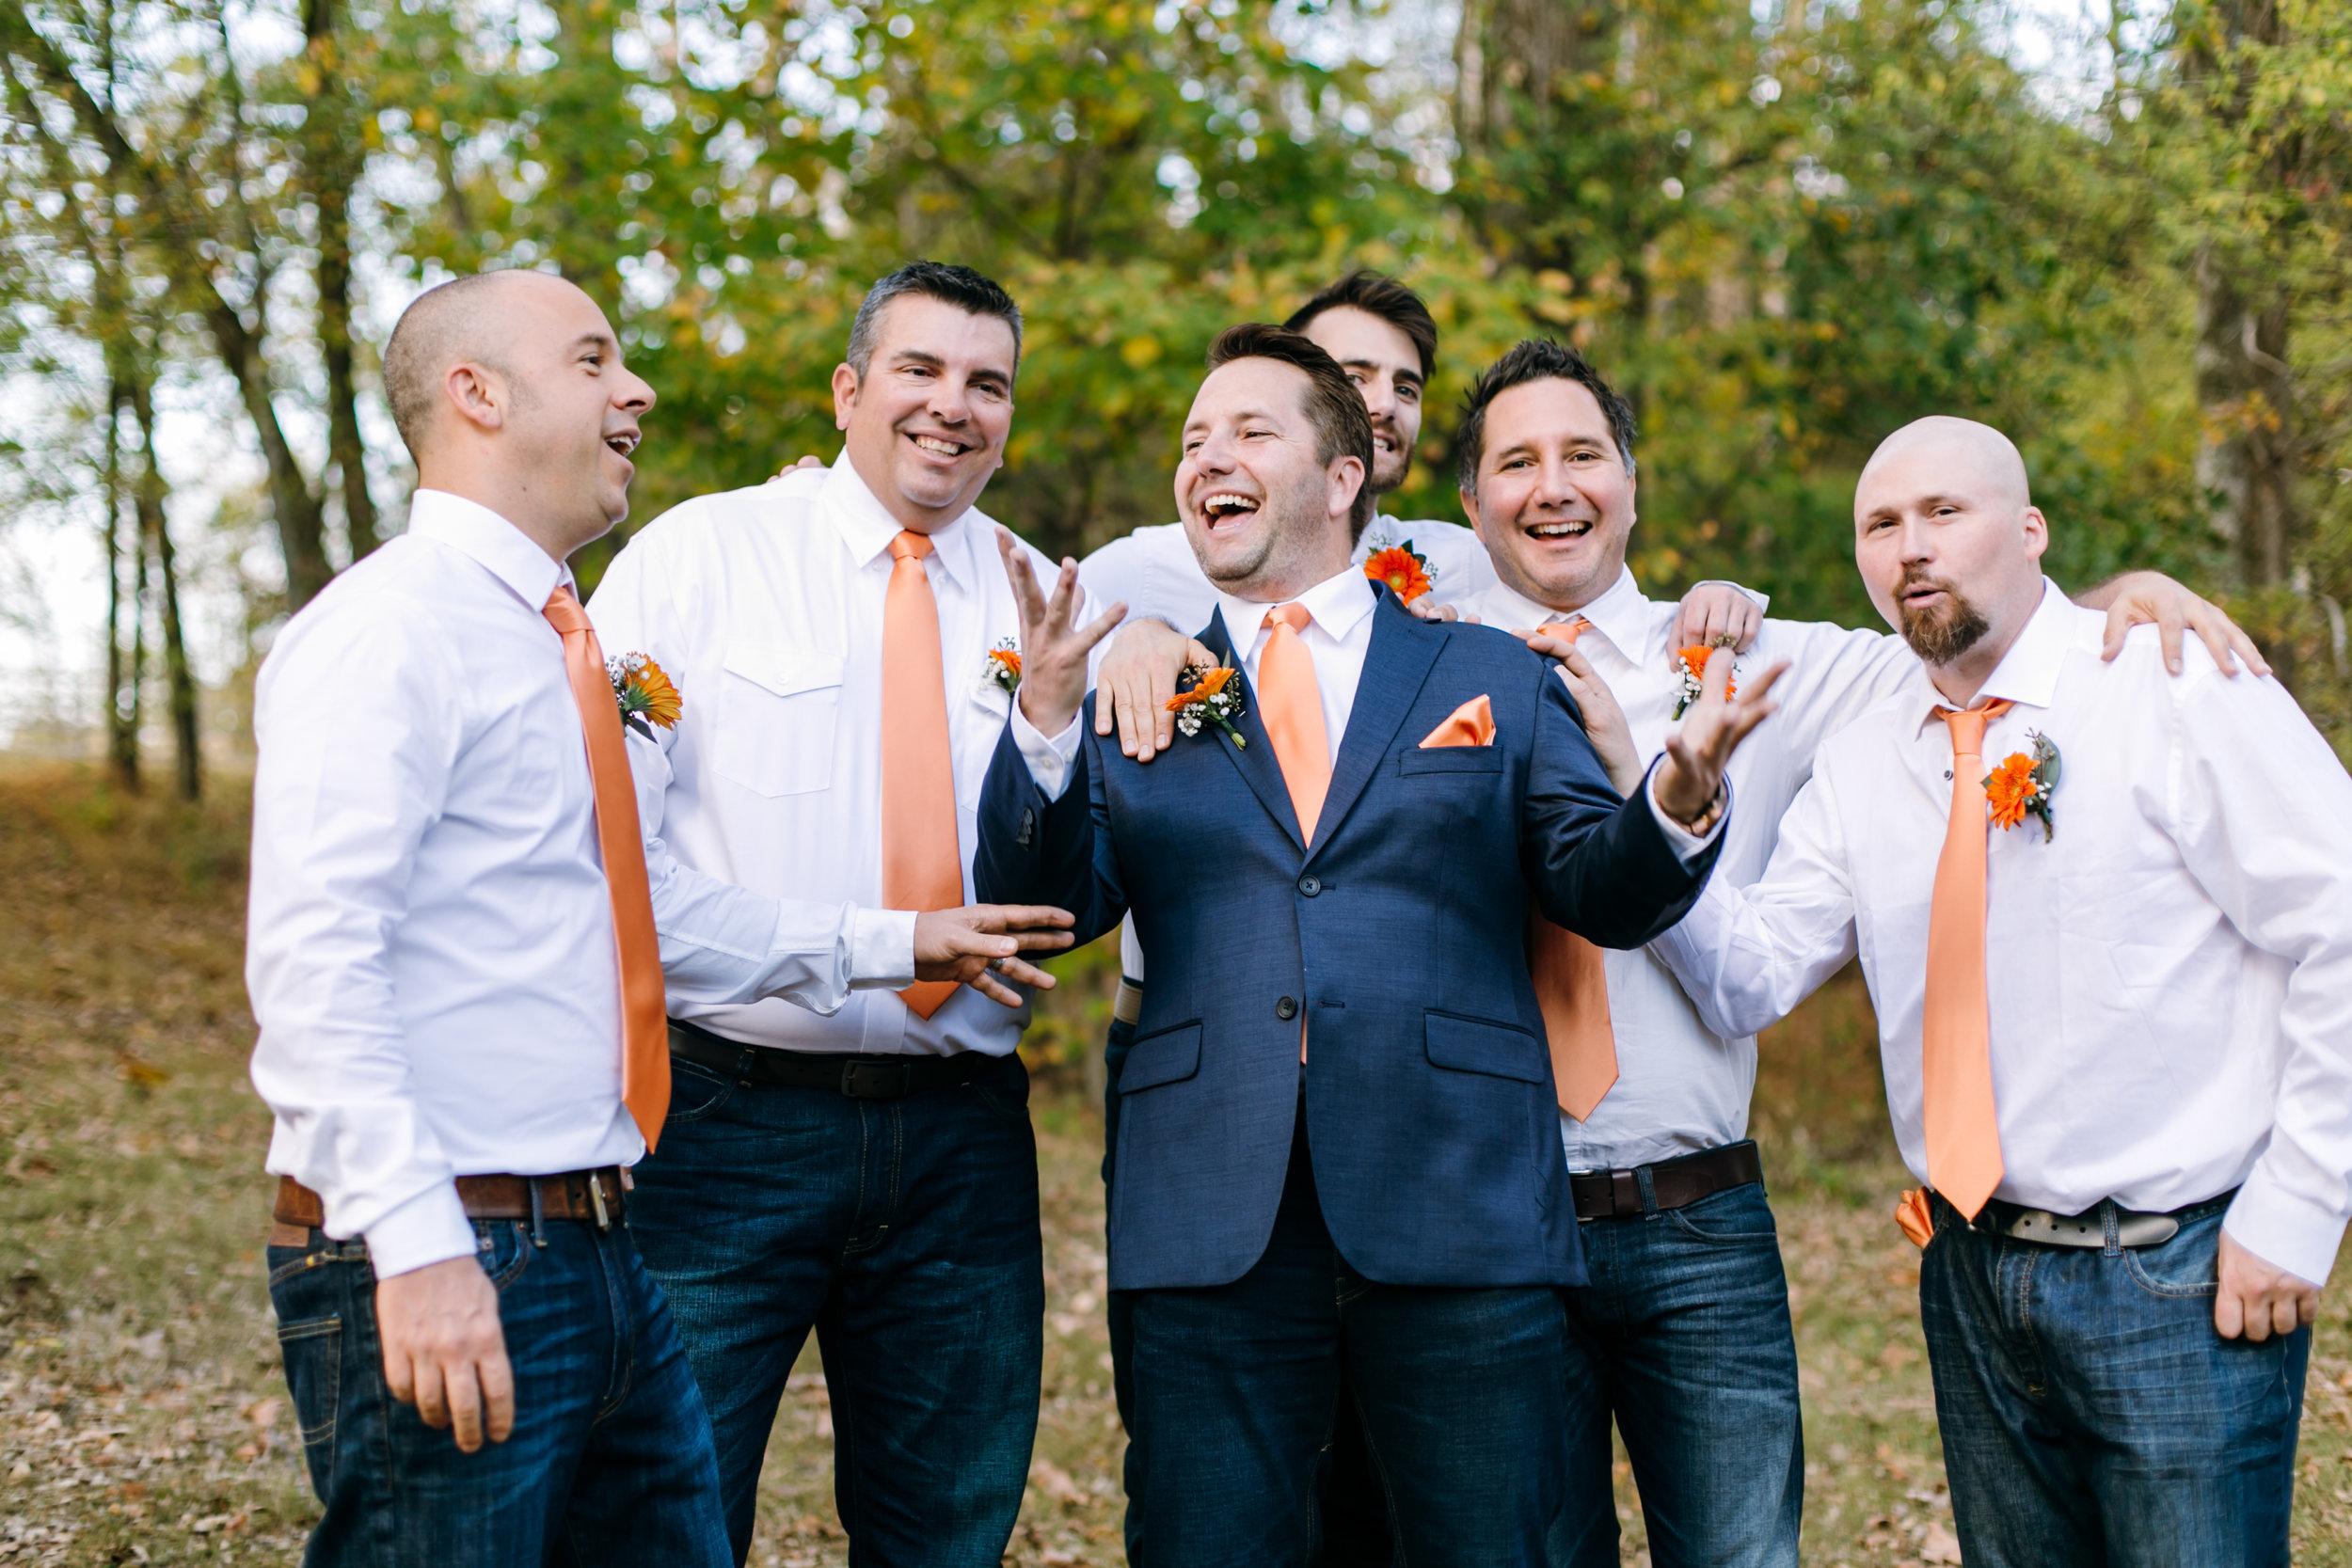 KaraNixonWeddings-Nashville-TN-Wedding-40.jpg